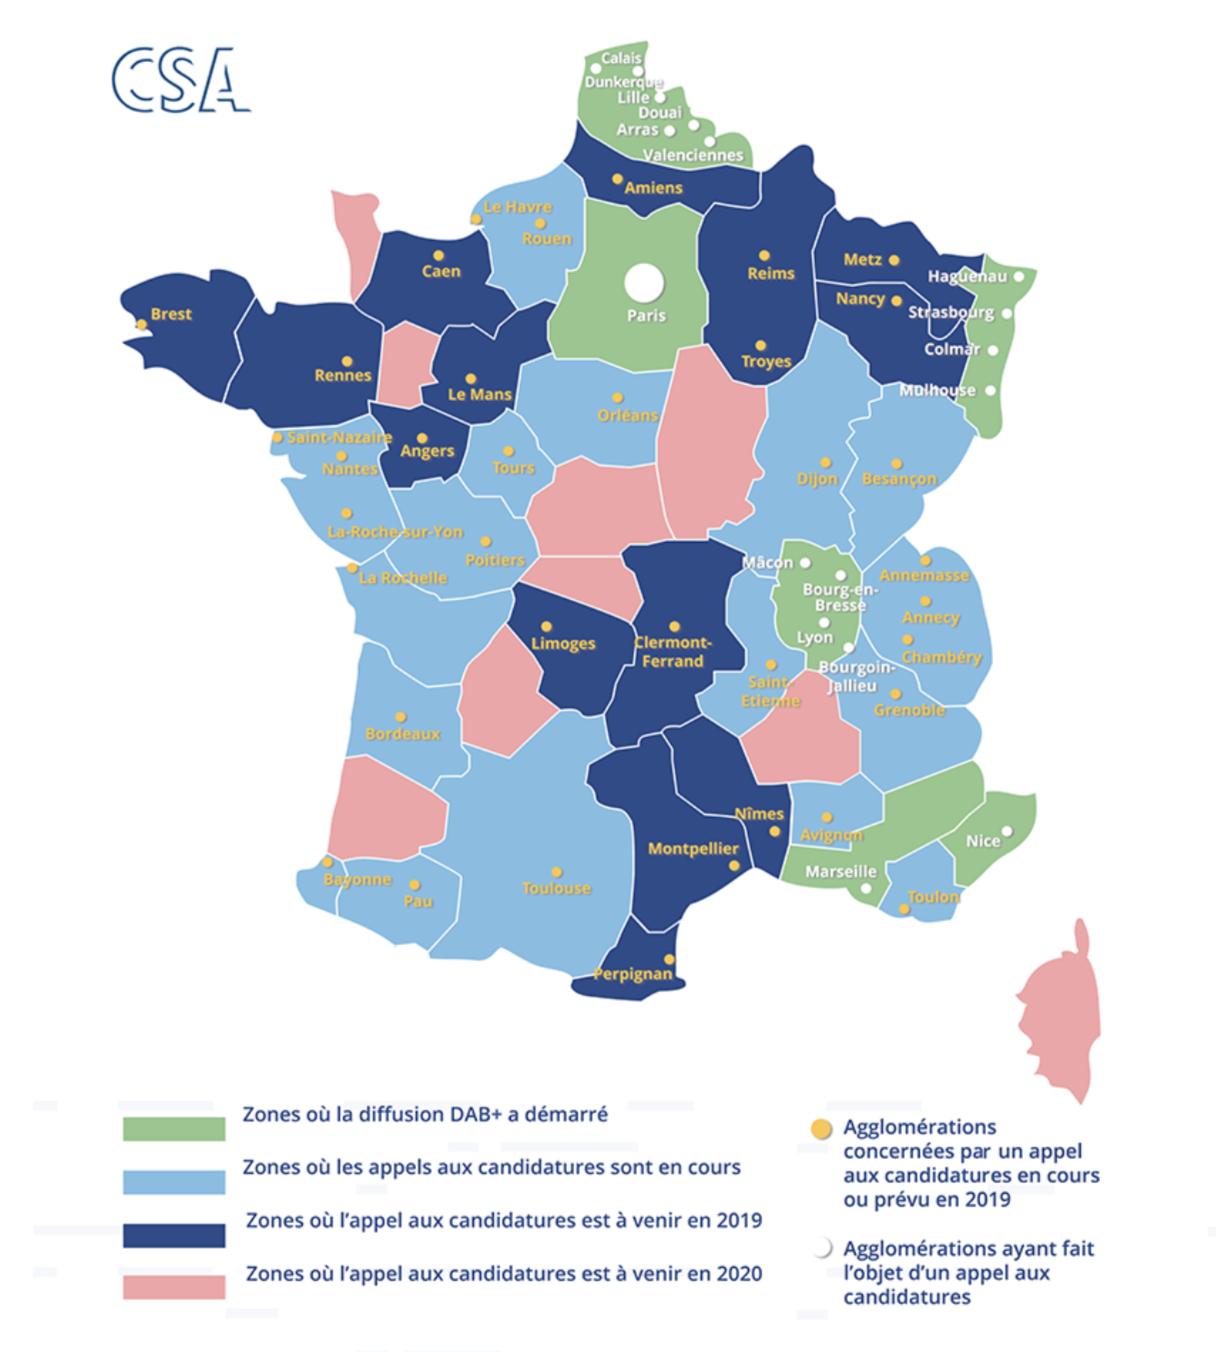 Carte de France - CSA DAB+